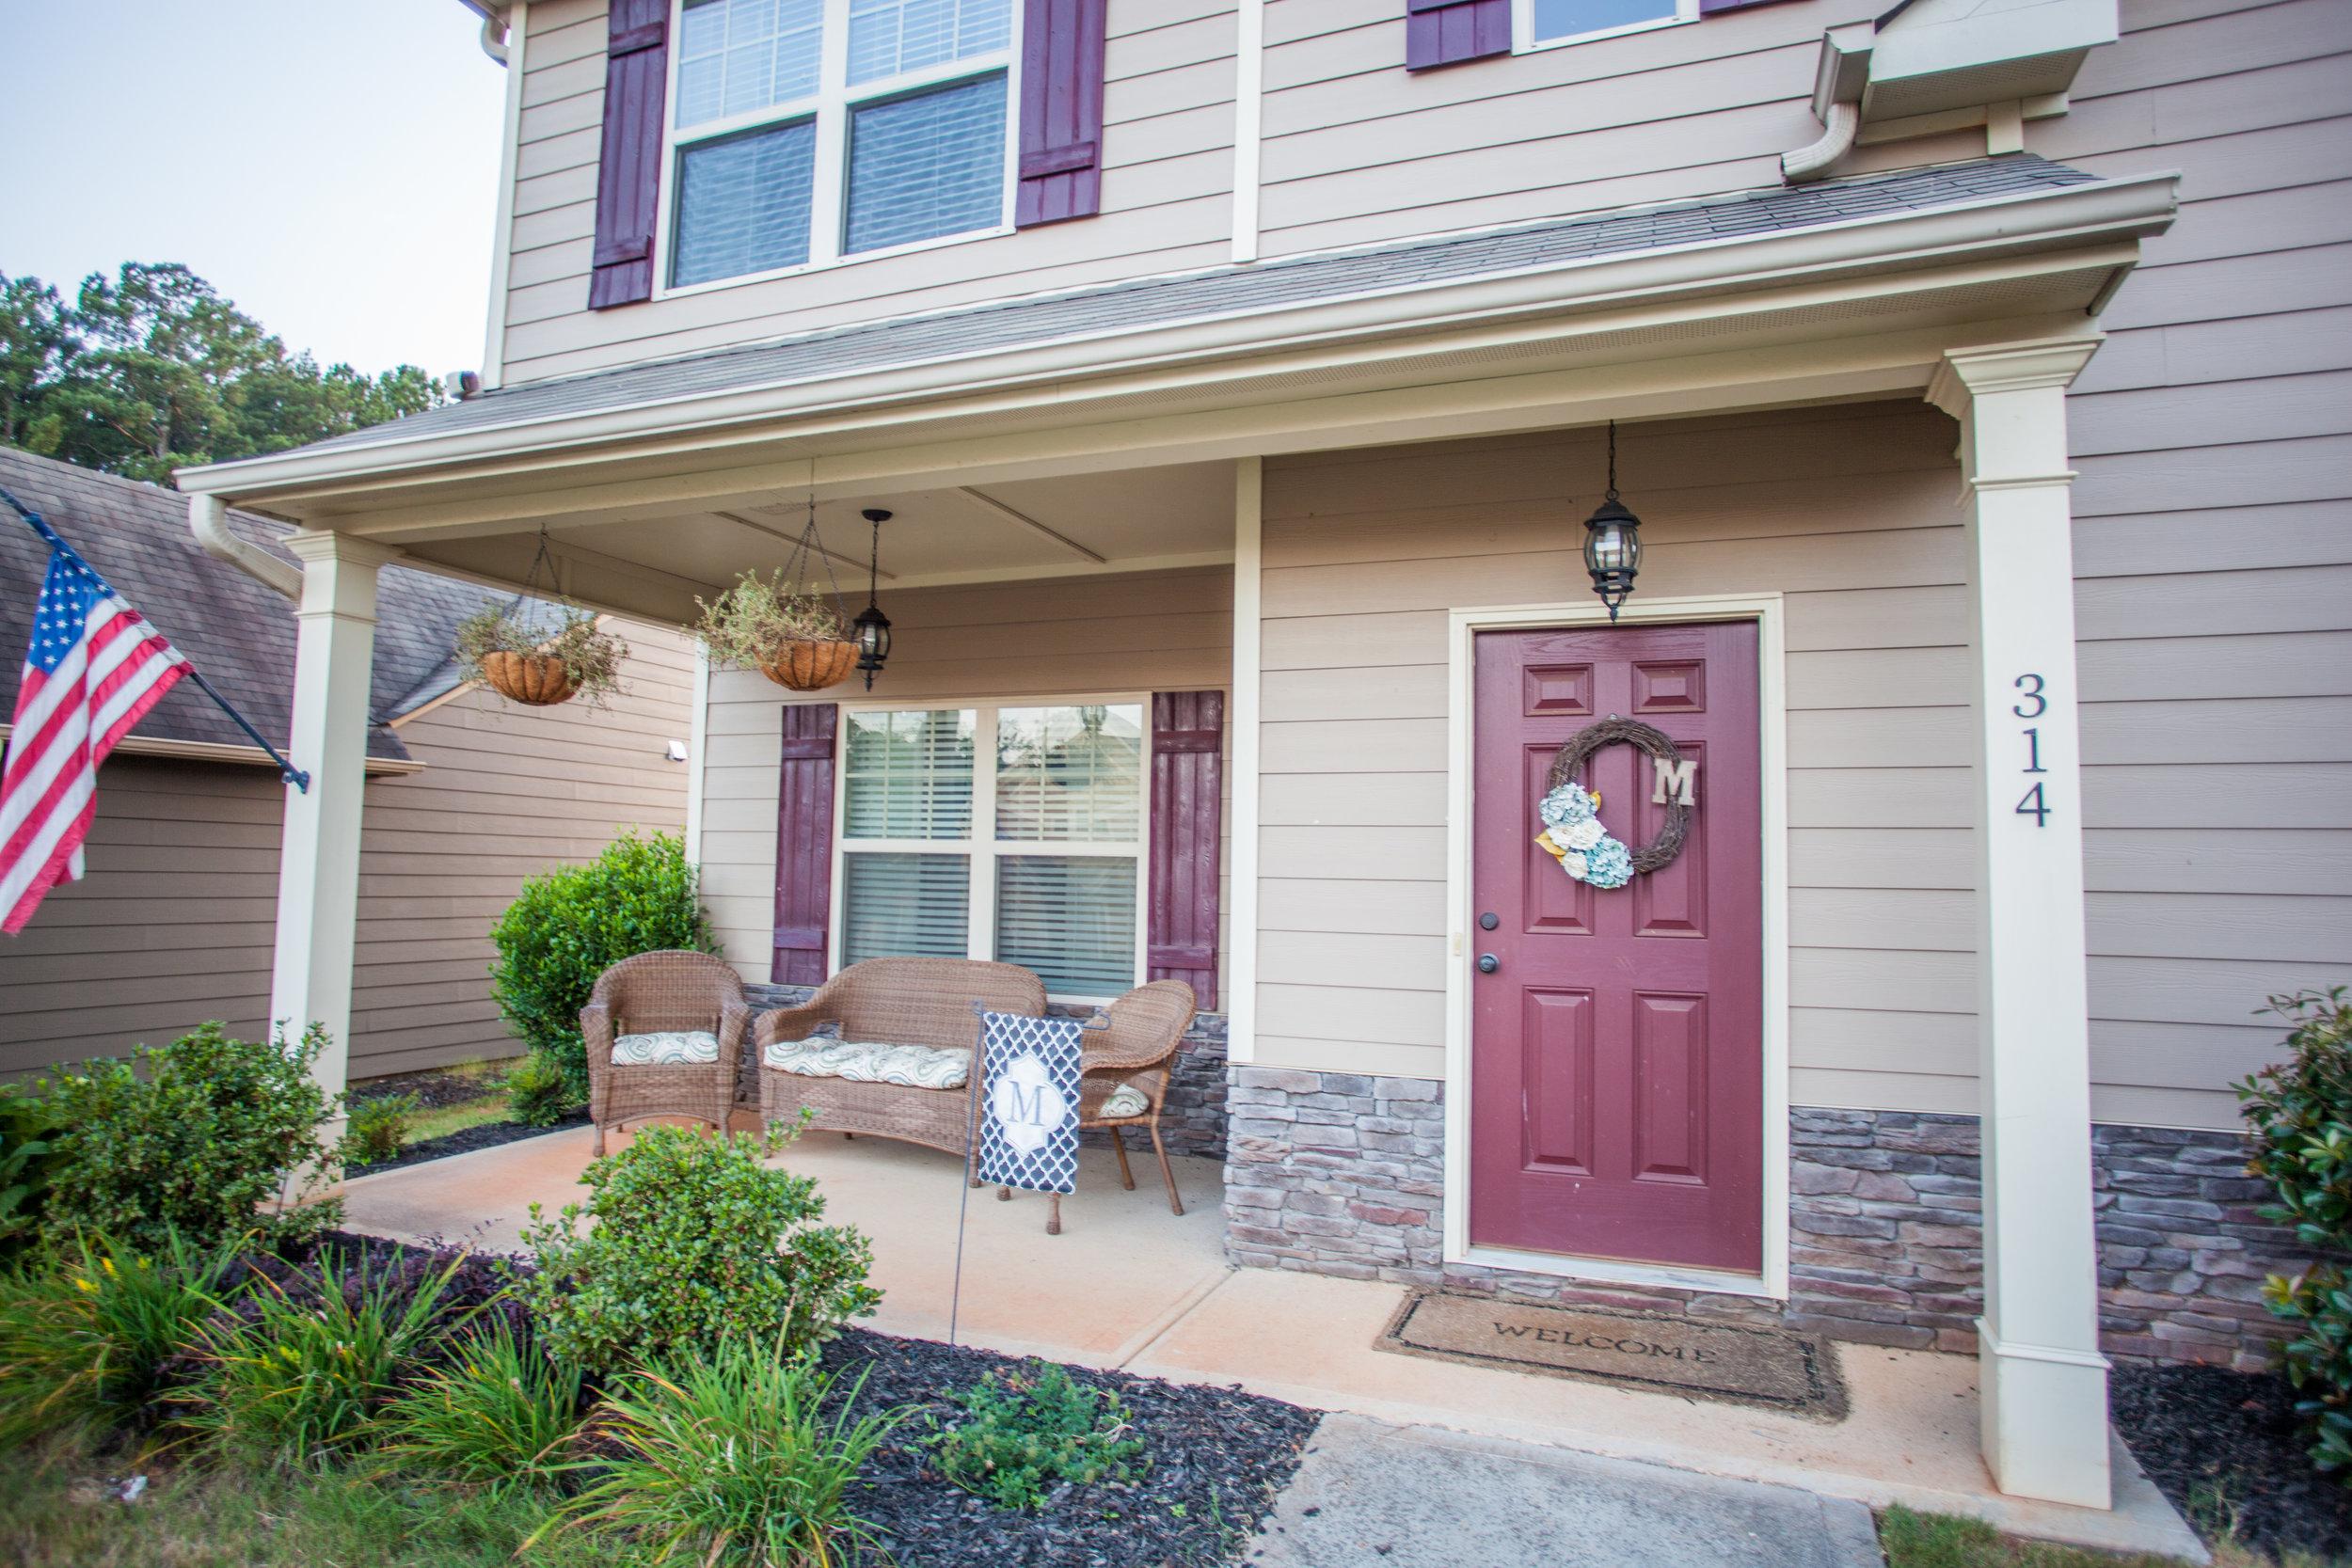 woodstock-ga-house-for-sale-wingard-real-estate-under-300k-63.jpg